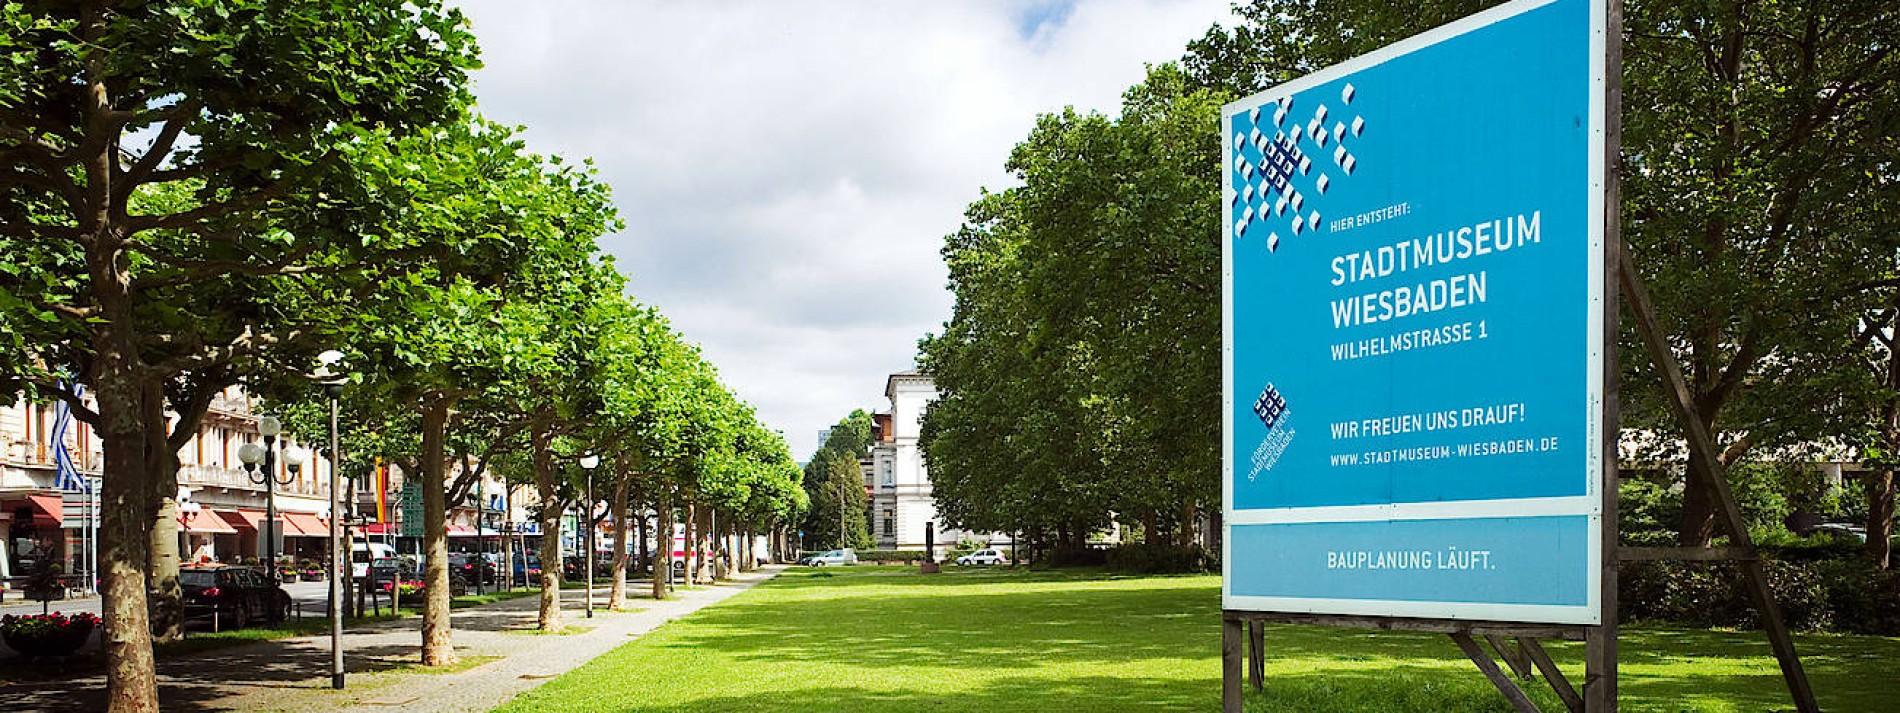 Immer mehr Ungereimtheiten wegen des Wiesbadener Stadtmuseums